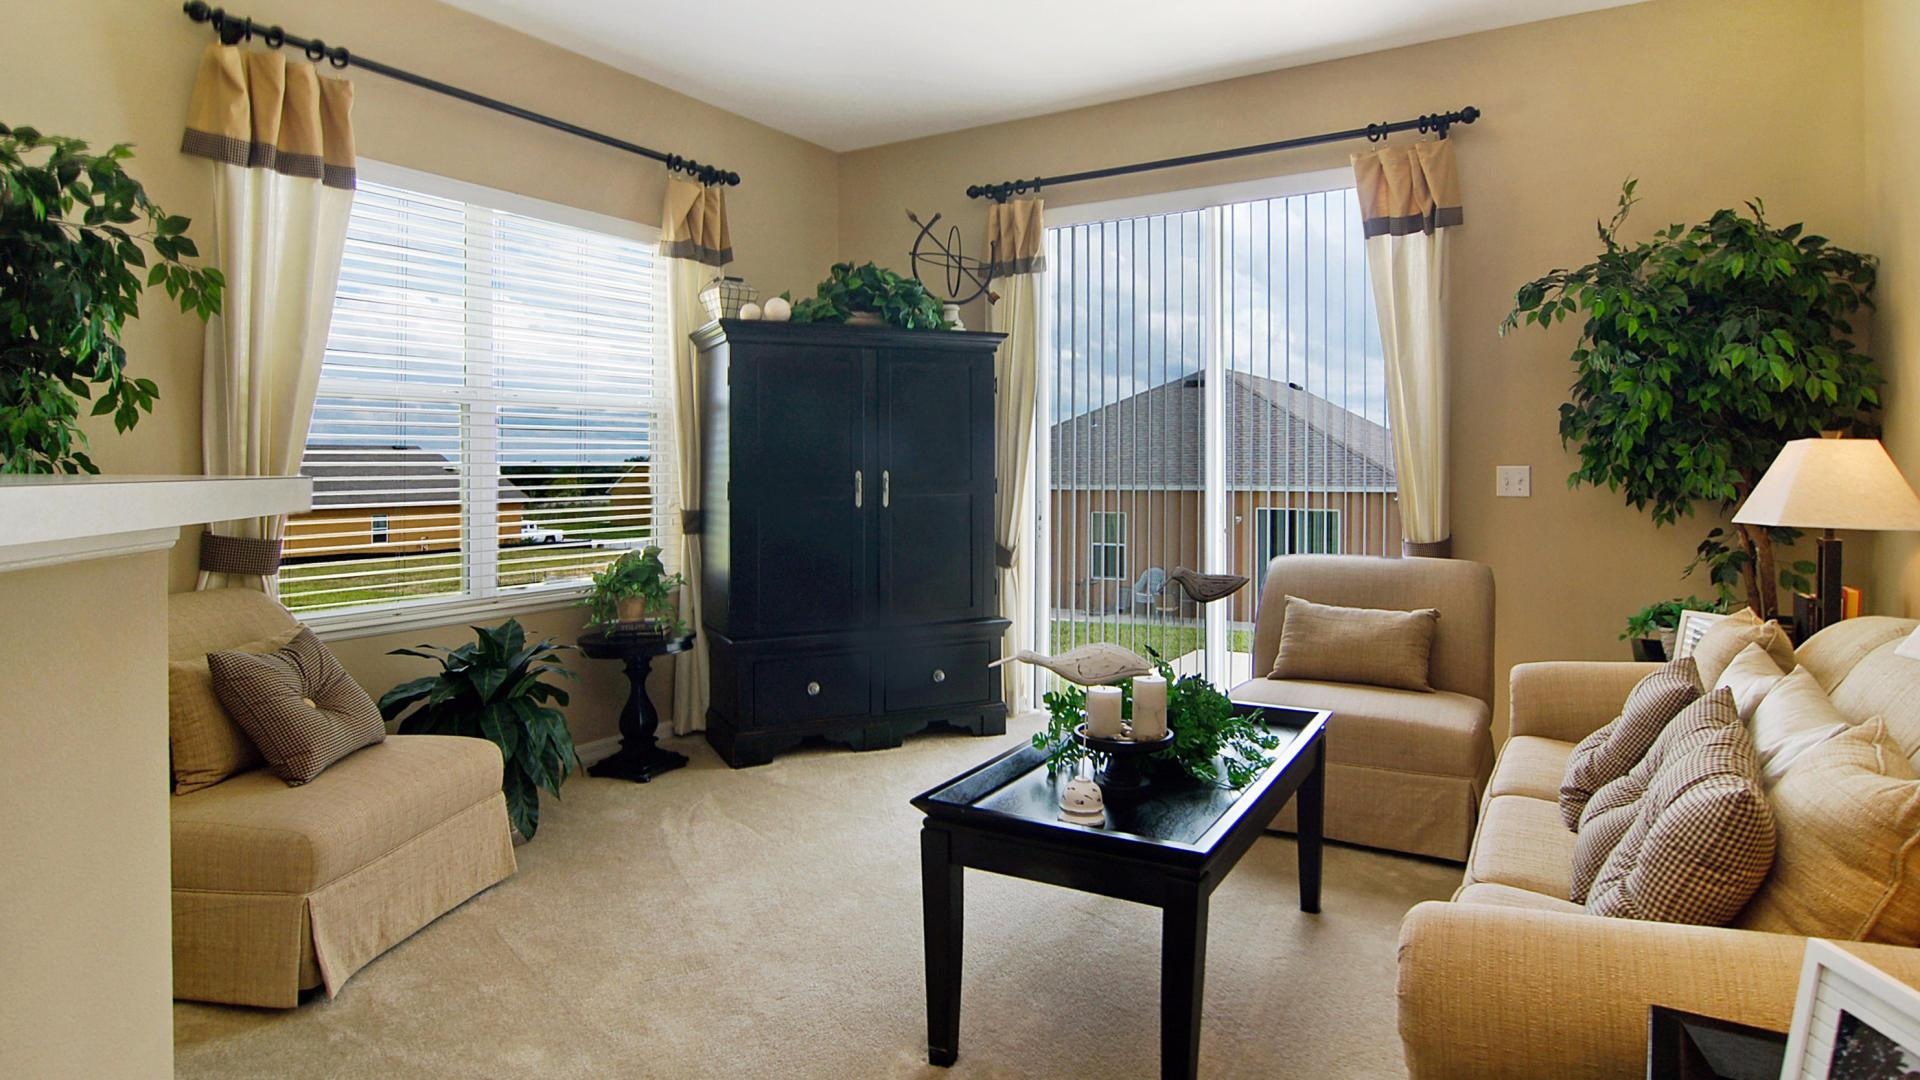 Living Area featured in the Arlington By Maronda Homes in Daytona Beach, FL